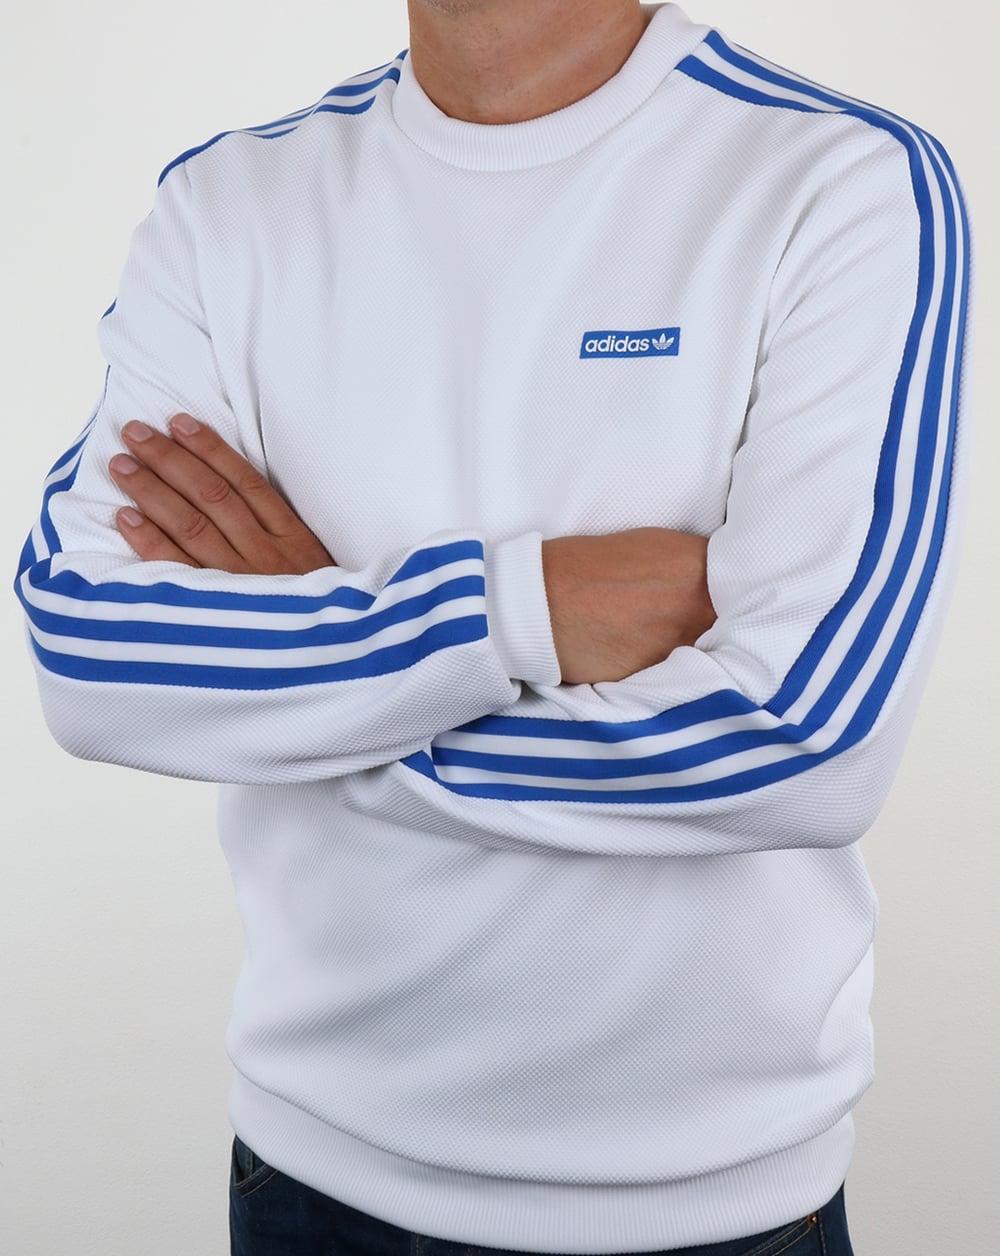 top fashion on wholesale hot sale Adidas Originals Tennoji Crew Sweat White/Blue